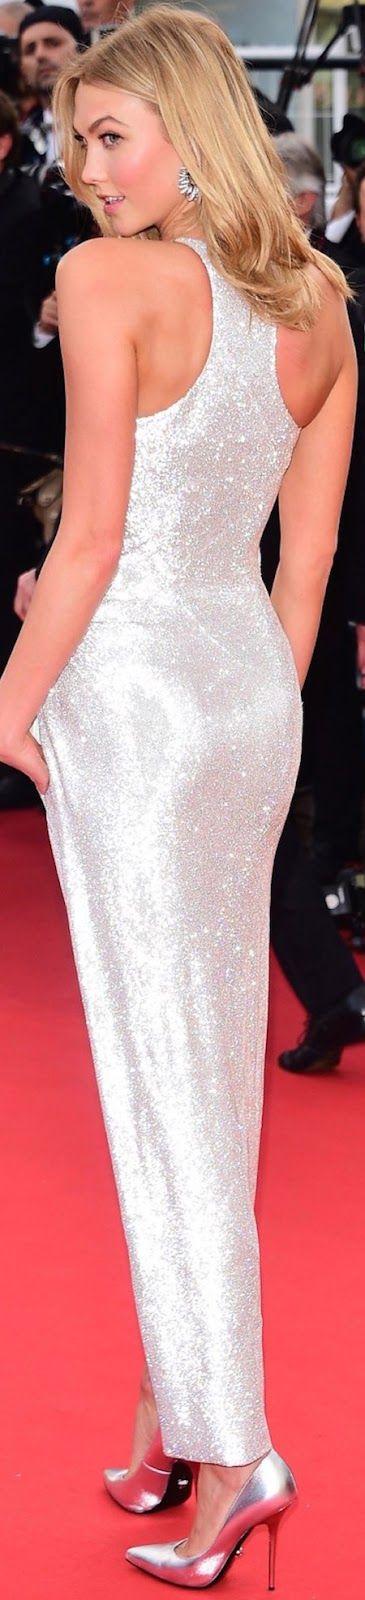 Sparkle Brighter... - Karlie Kloss in Versace 2015 Cannes Film Festival